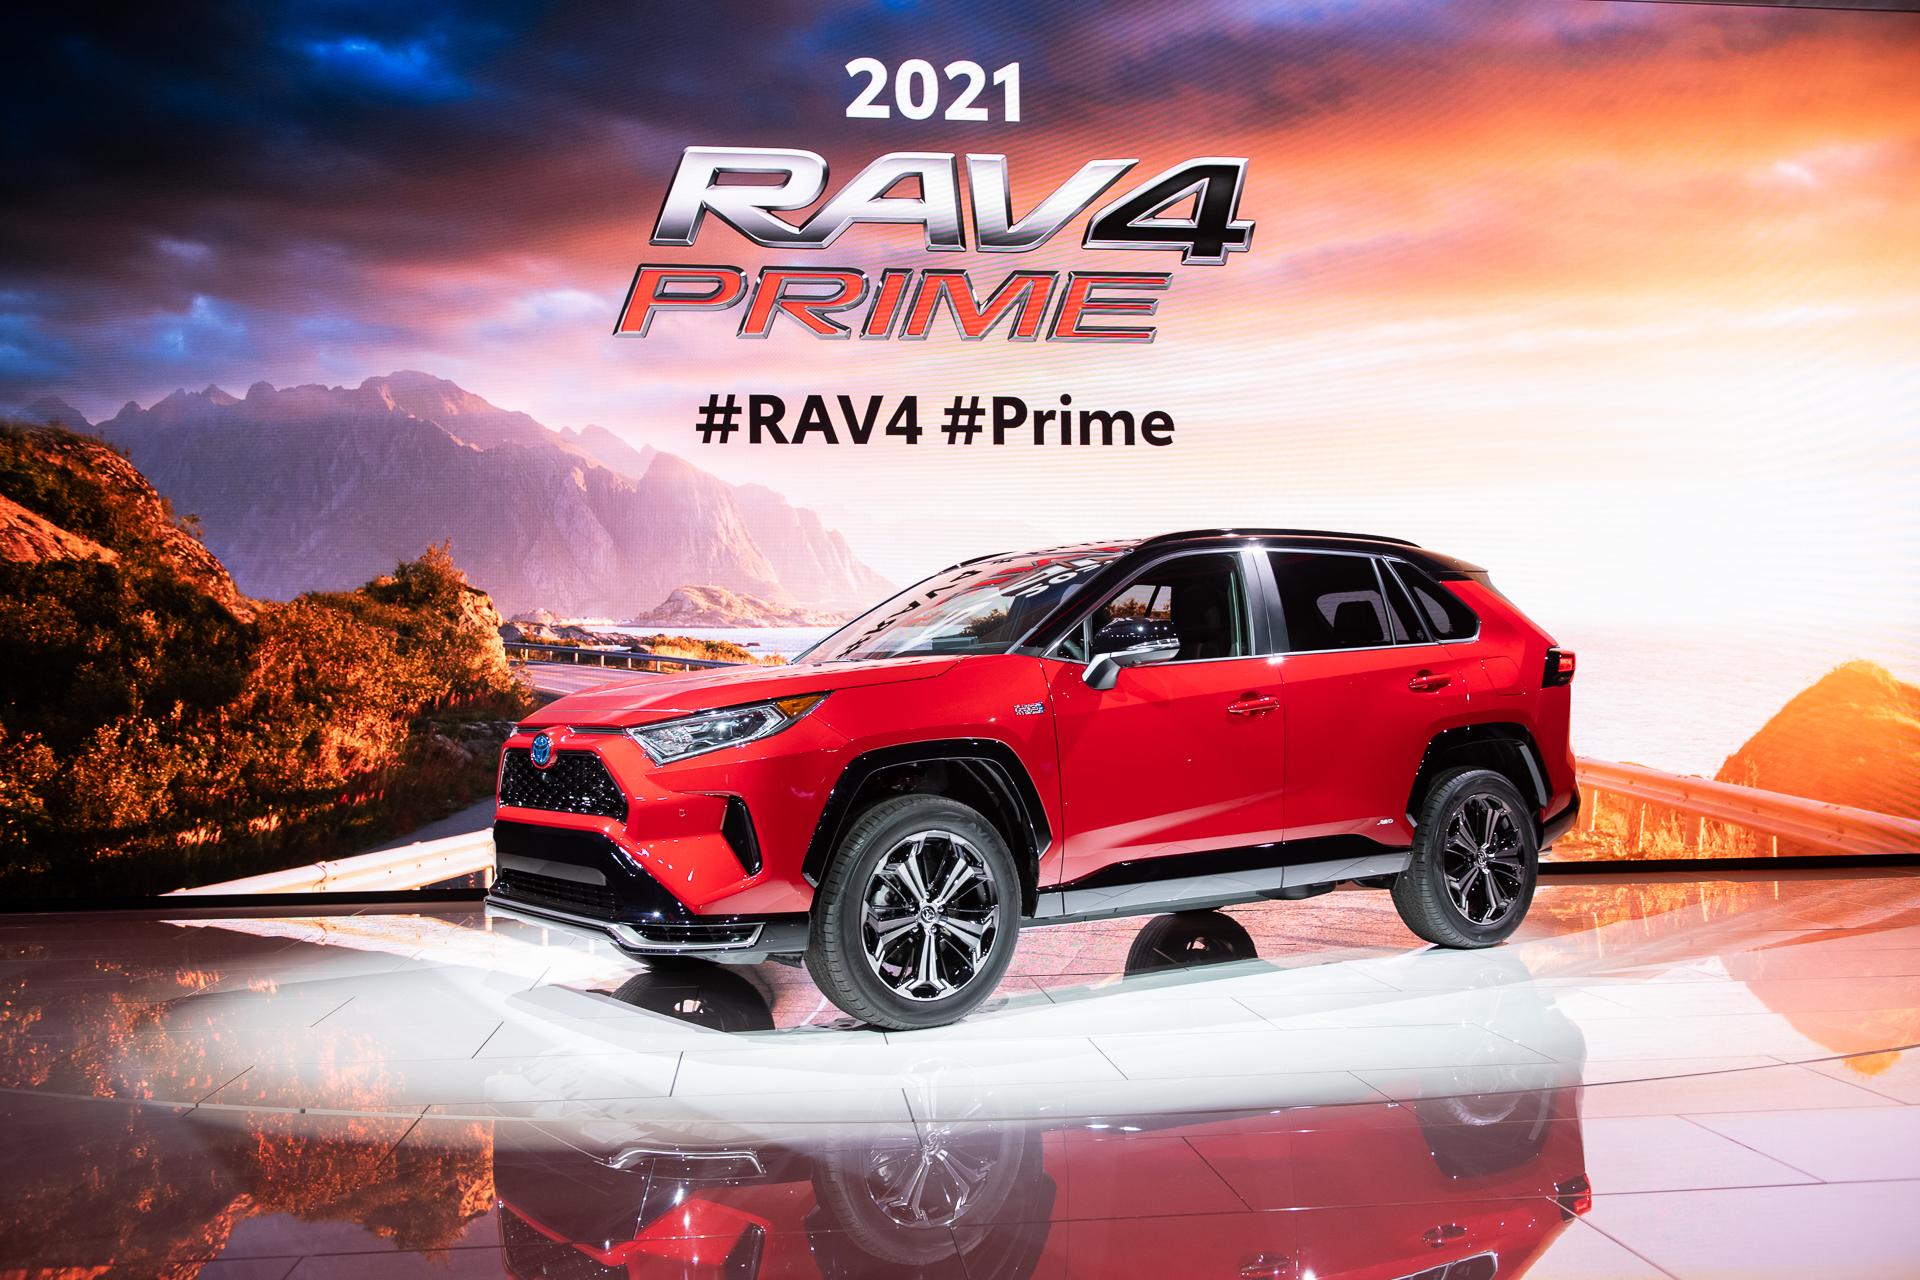 2021 Toyota Rav4 Prime Plug In Hybrid Crossover Suv Will Cost 39 220 To Start